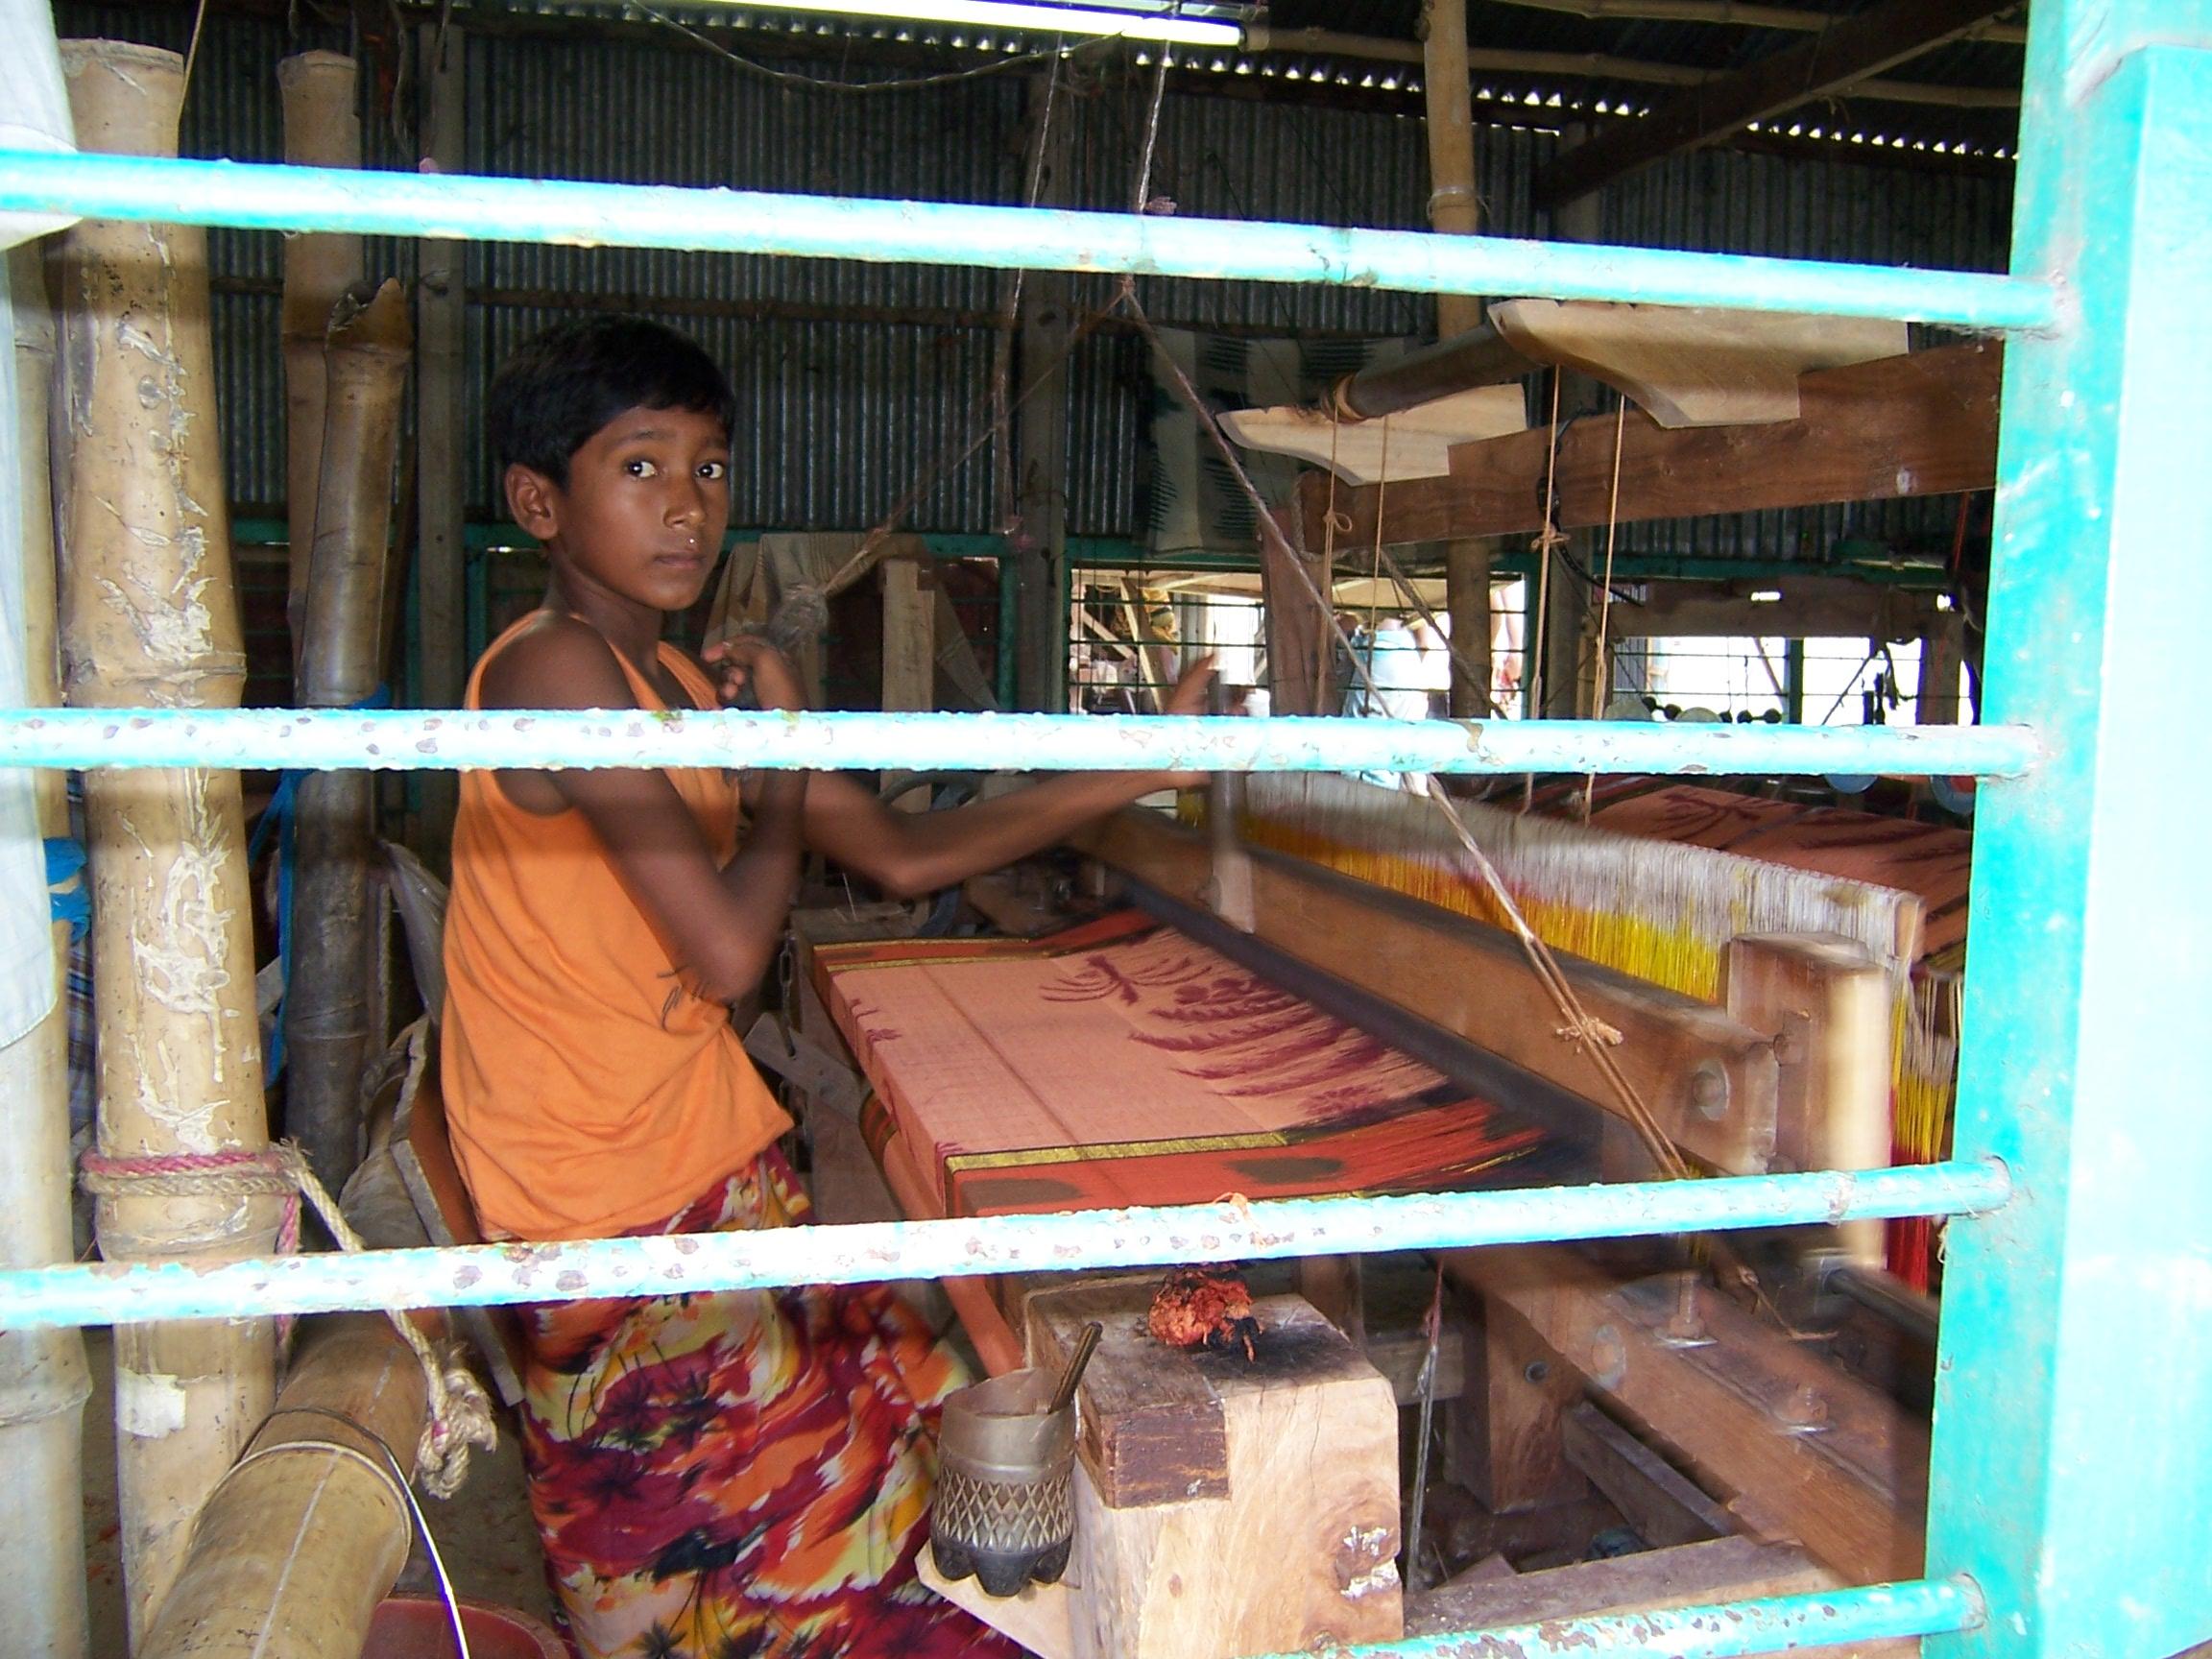 A boy working on silk in a factory